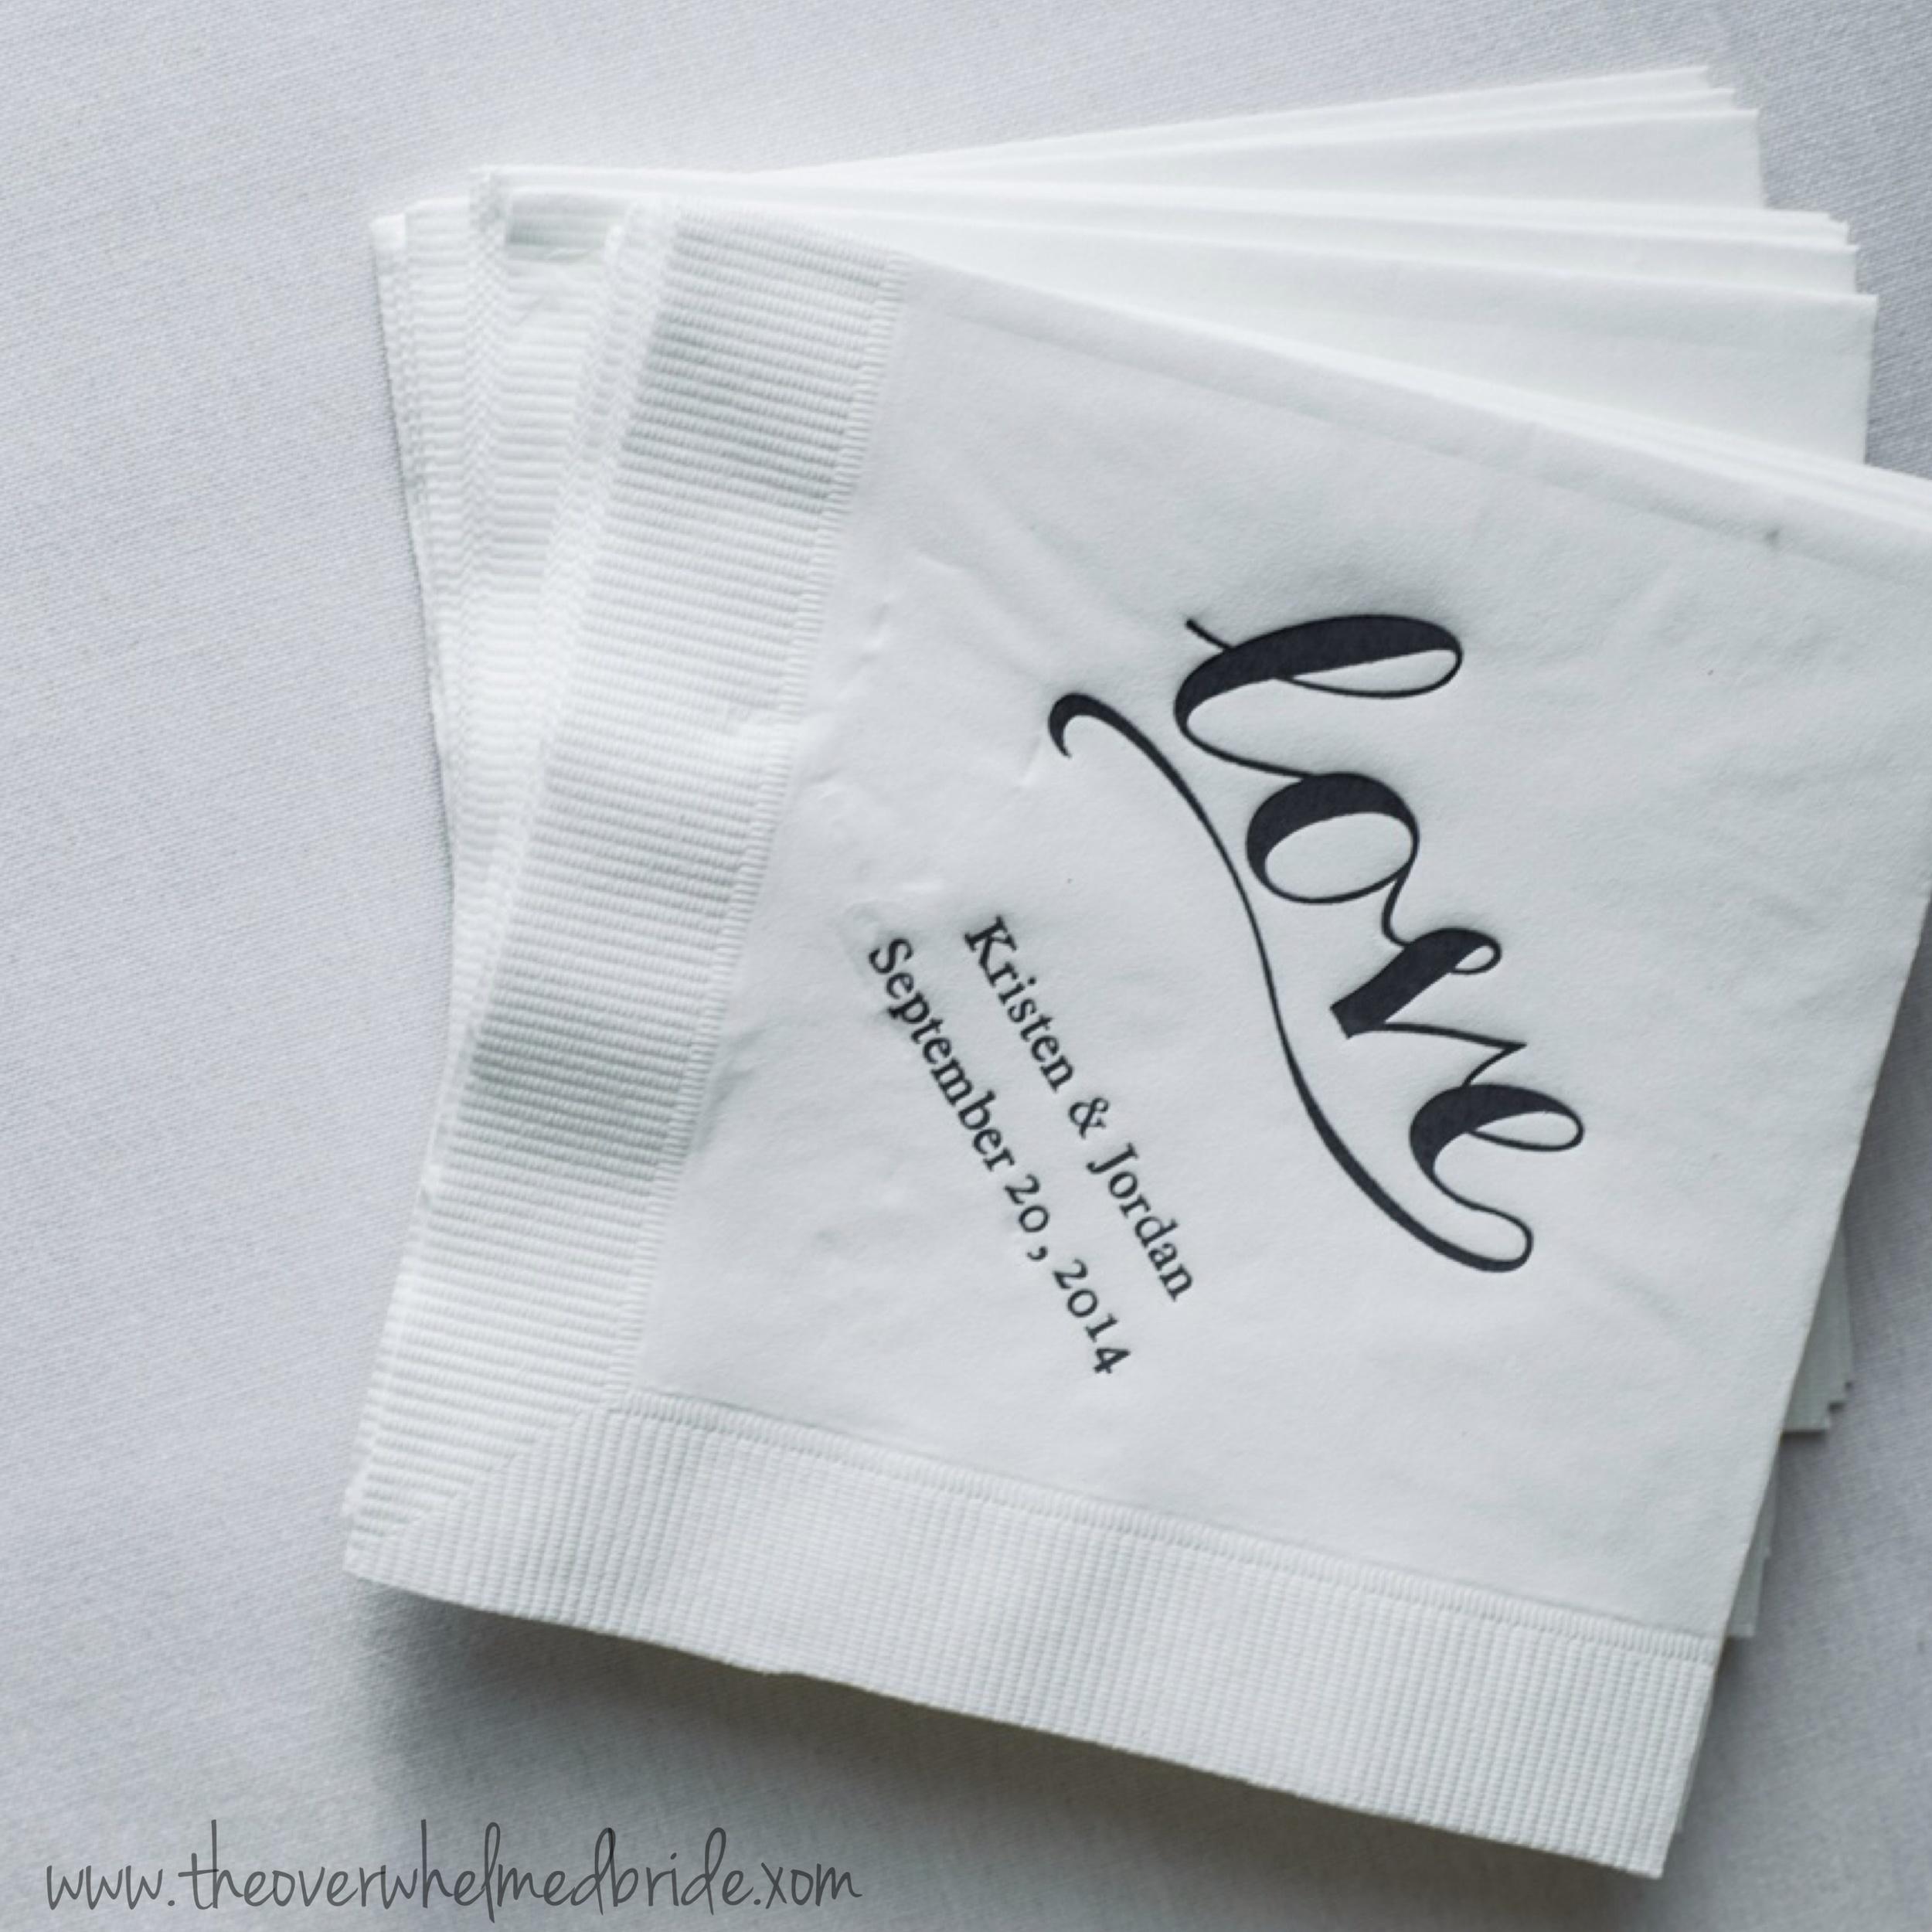 marin county wedding venue // southern california wedding planner // the overwhelmed bride wedding blog